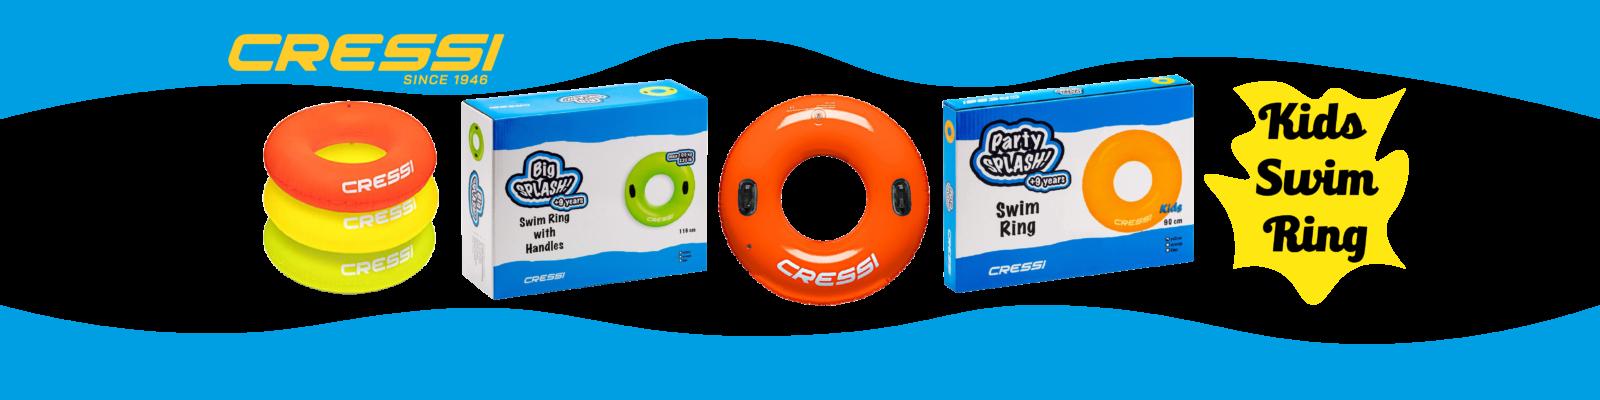 Cressi Kids Swim Ring